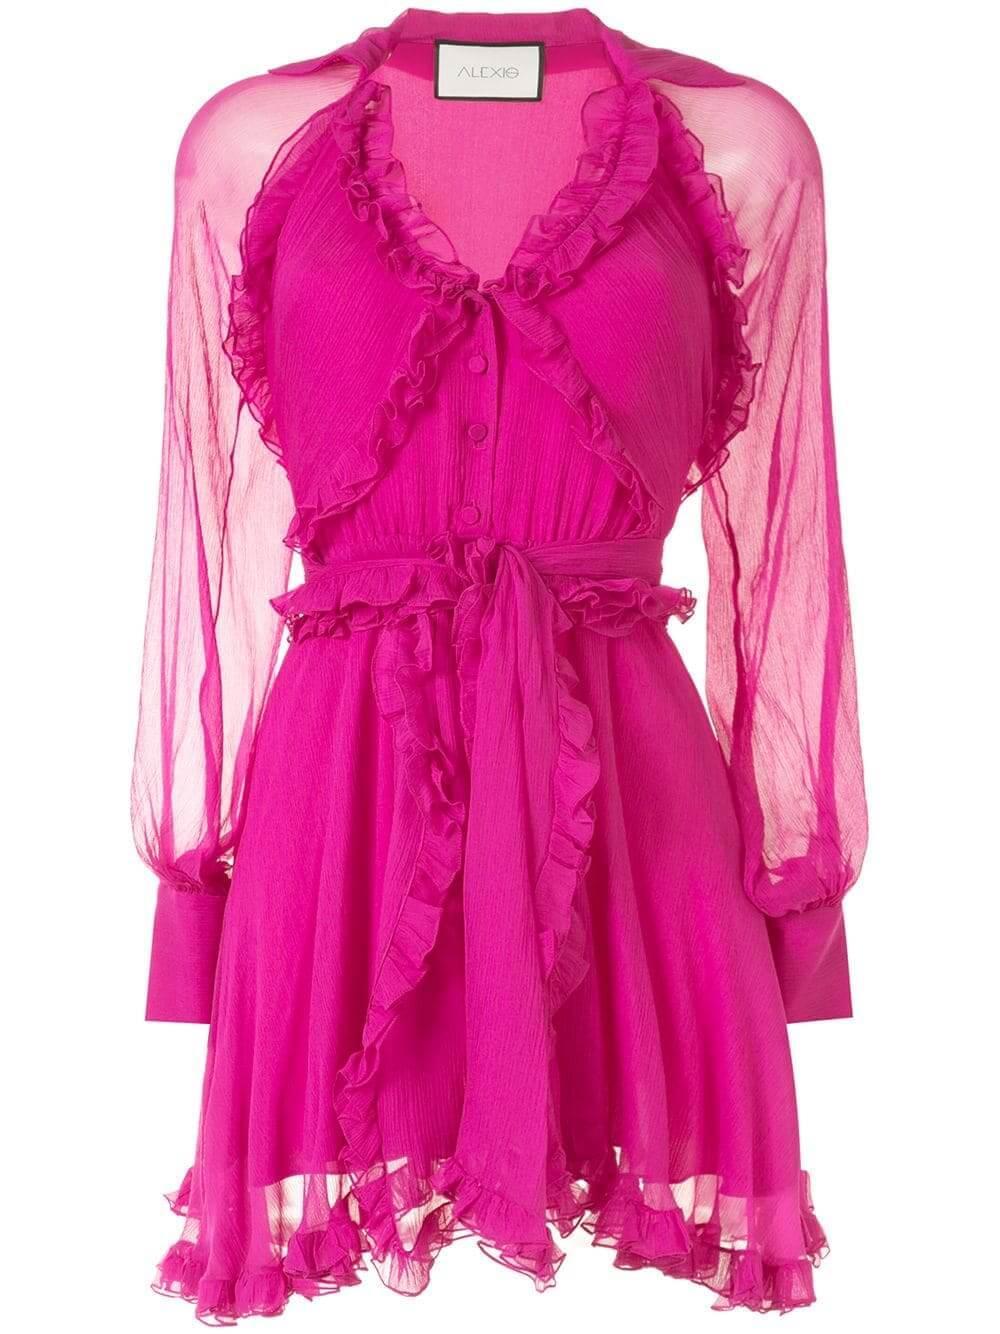 Suzette Dress Item # A2200307-6339